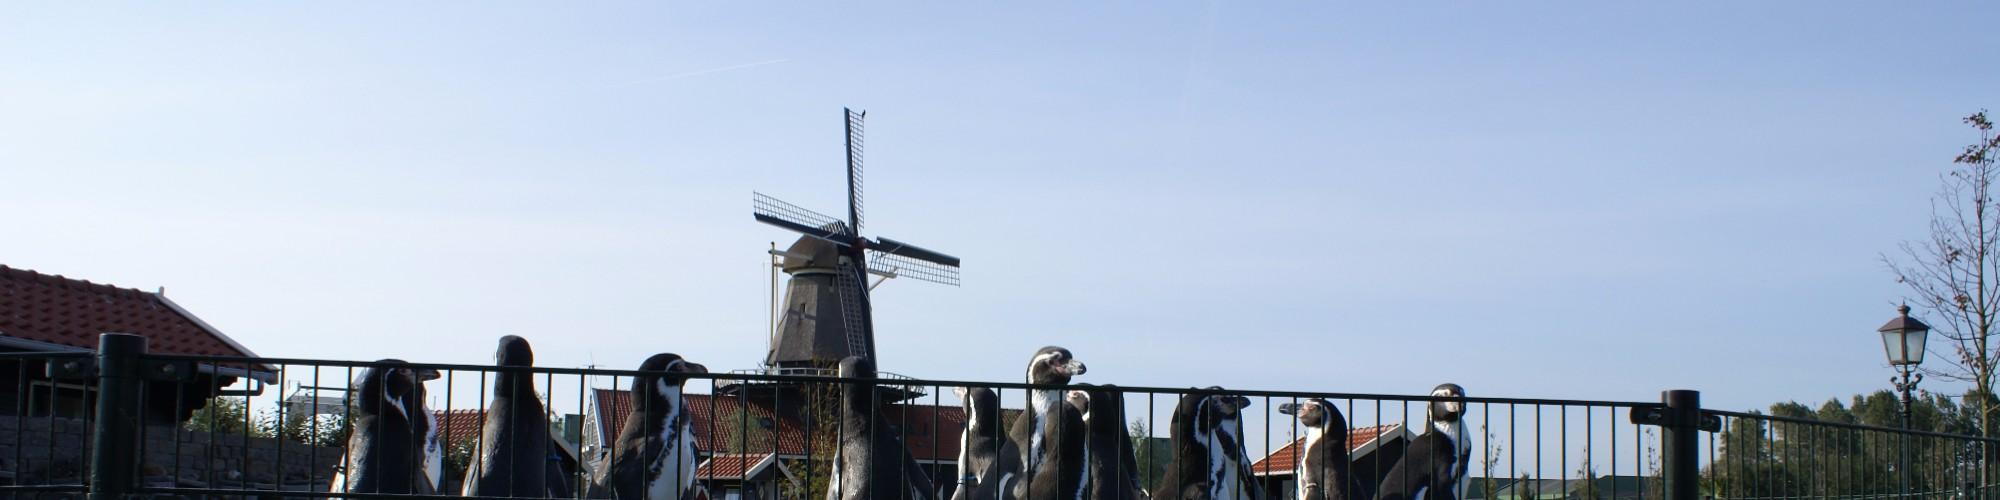 Van Blanckendeall Park - Tuitjenhorn.JPG